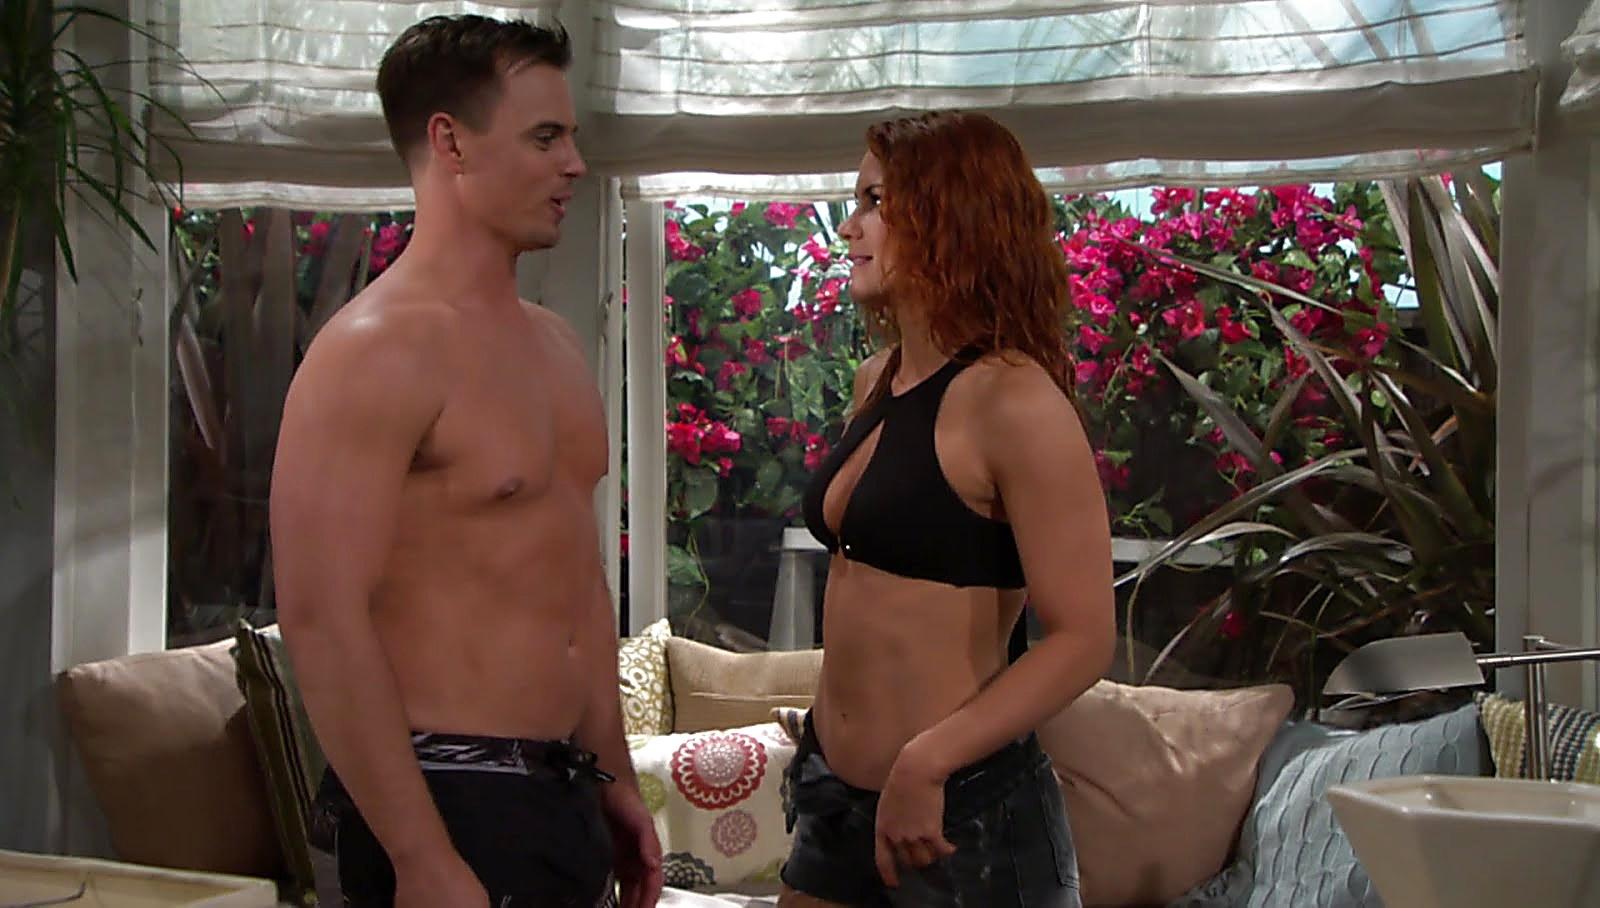 Darin Brooks sexy shirtless scene July 11, 2018, 2pm